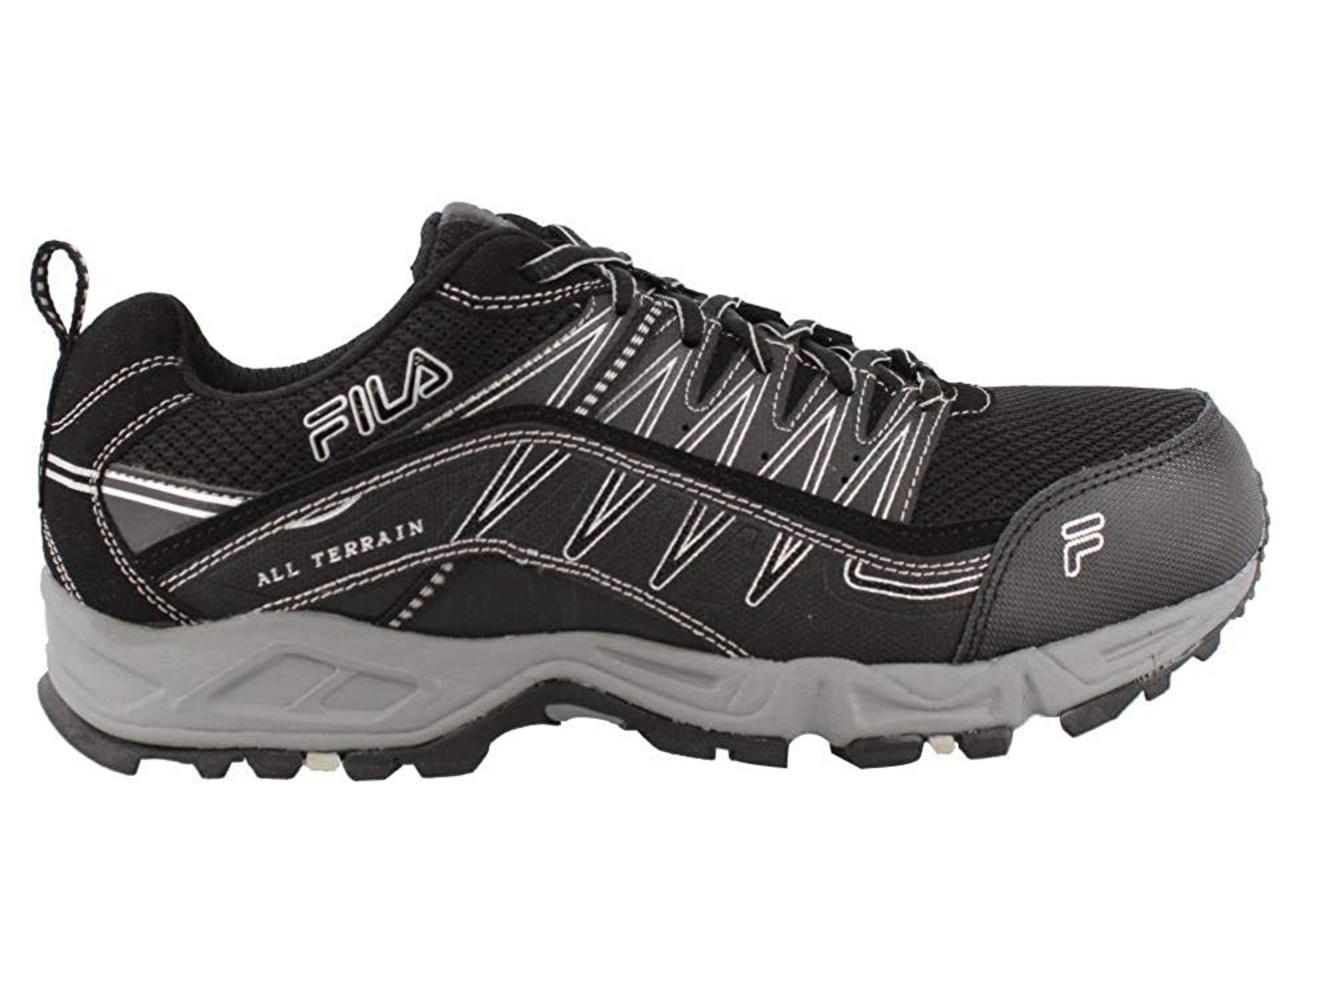 Peak Steel Toe Trail Runner | Walmart